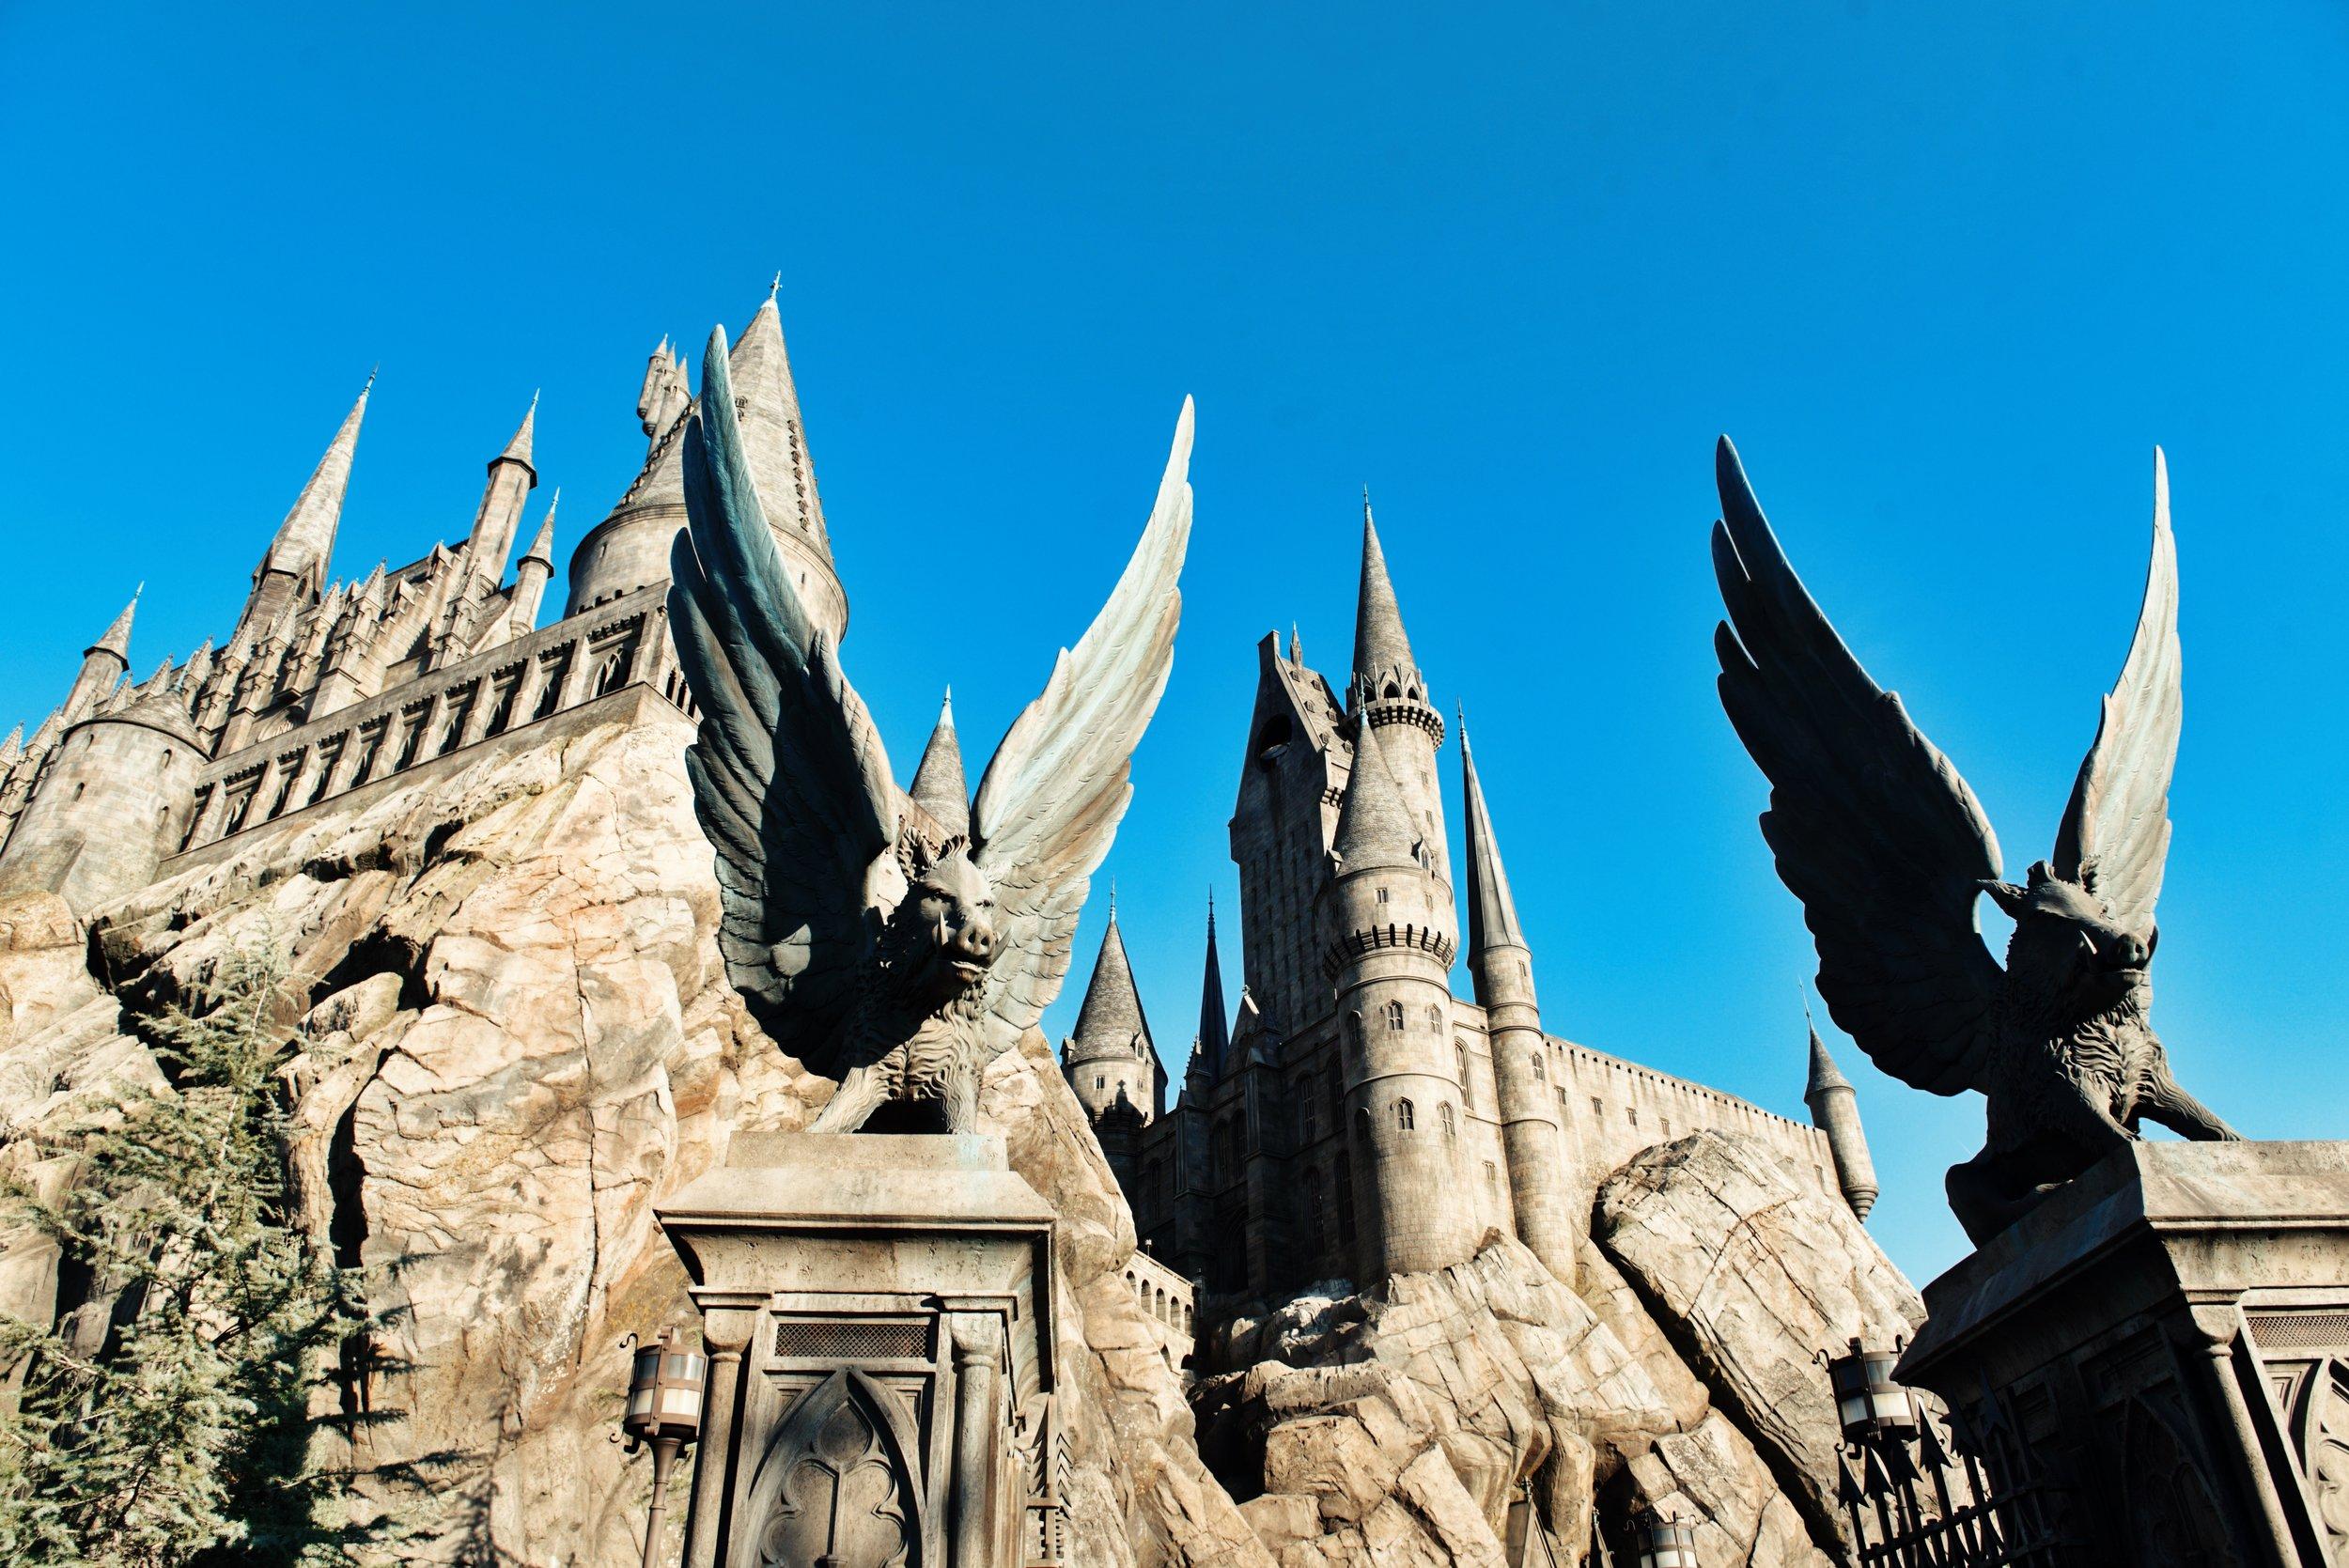 hogsmeade Harry Potter world